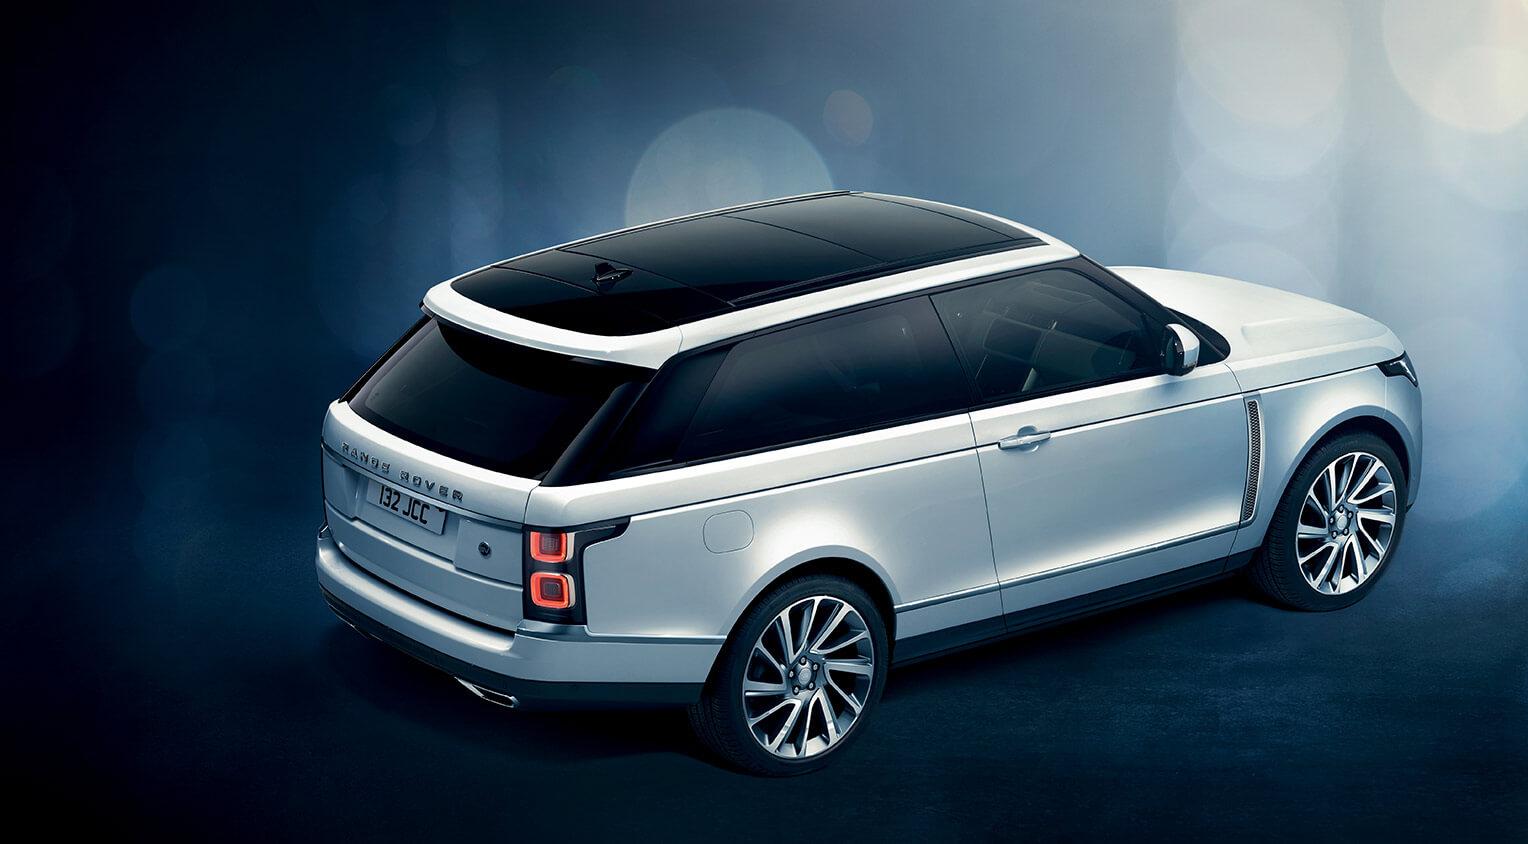 Range Rover SV Coupe trasera